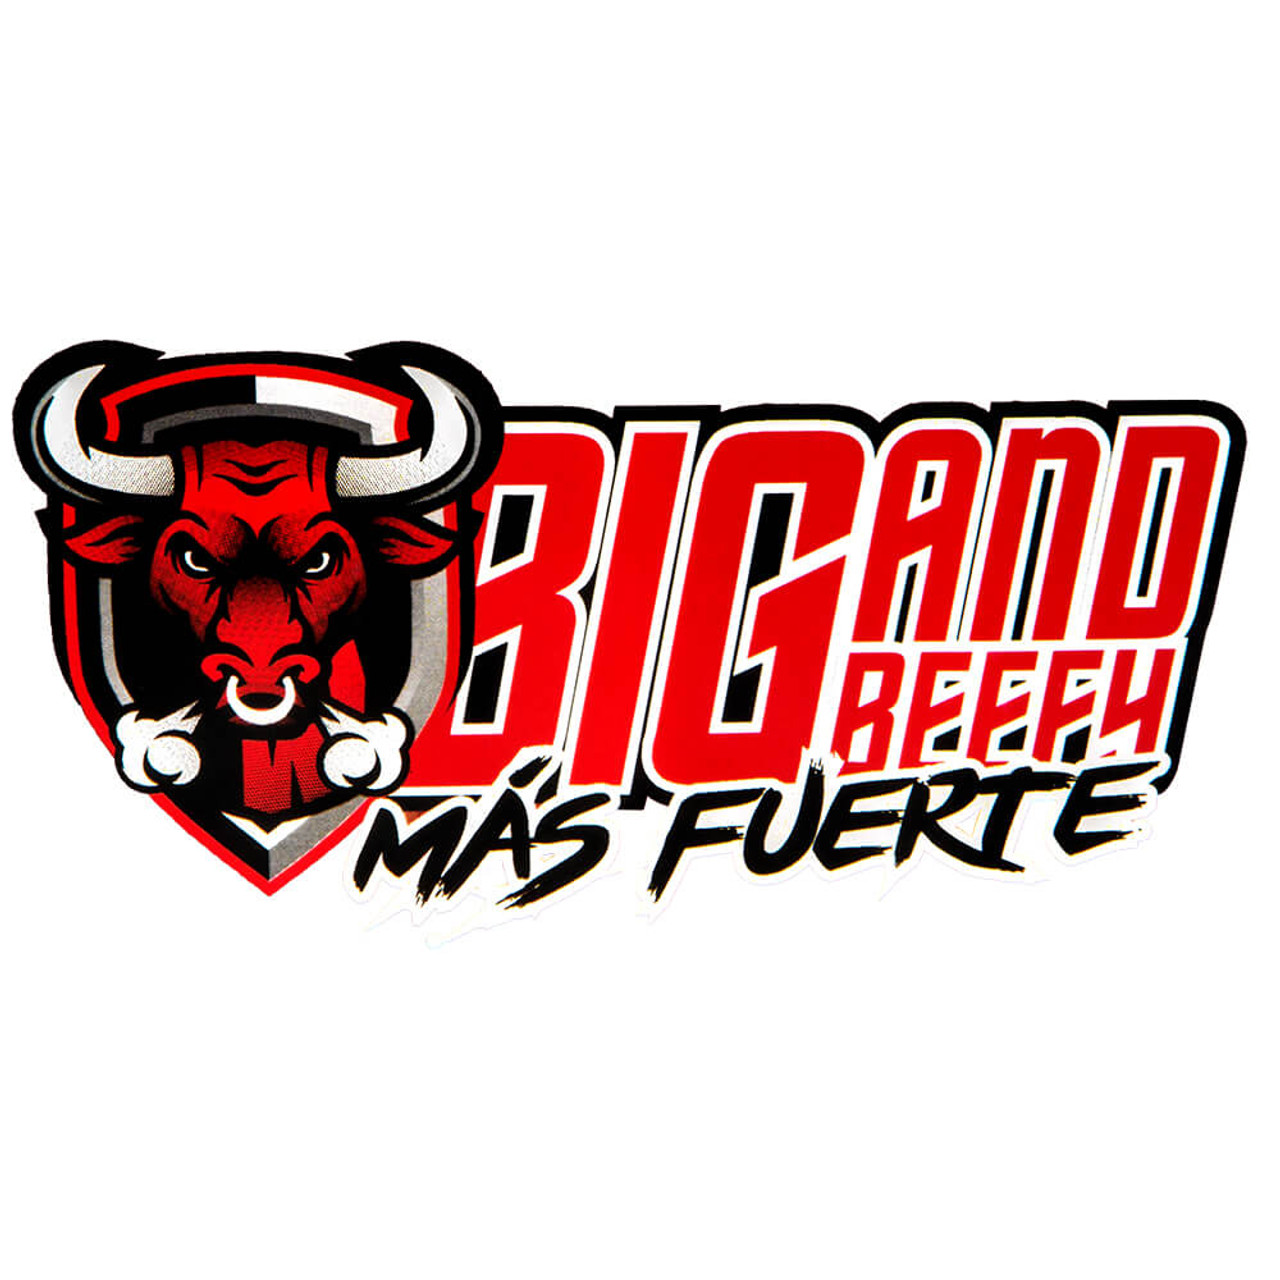 Big and Beefy Mas Fuerte No. 654 Cigars - 6.5 x 54 (Bundle of 10)